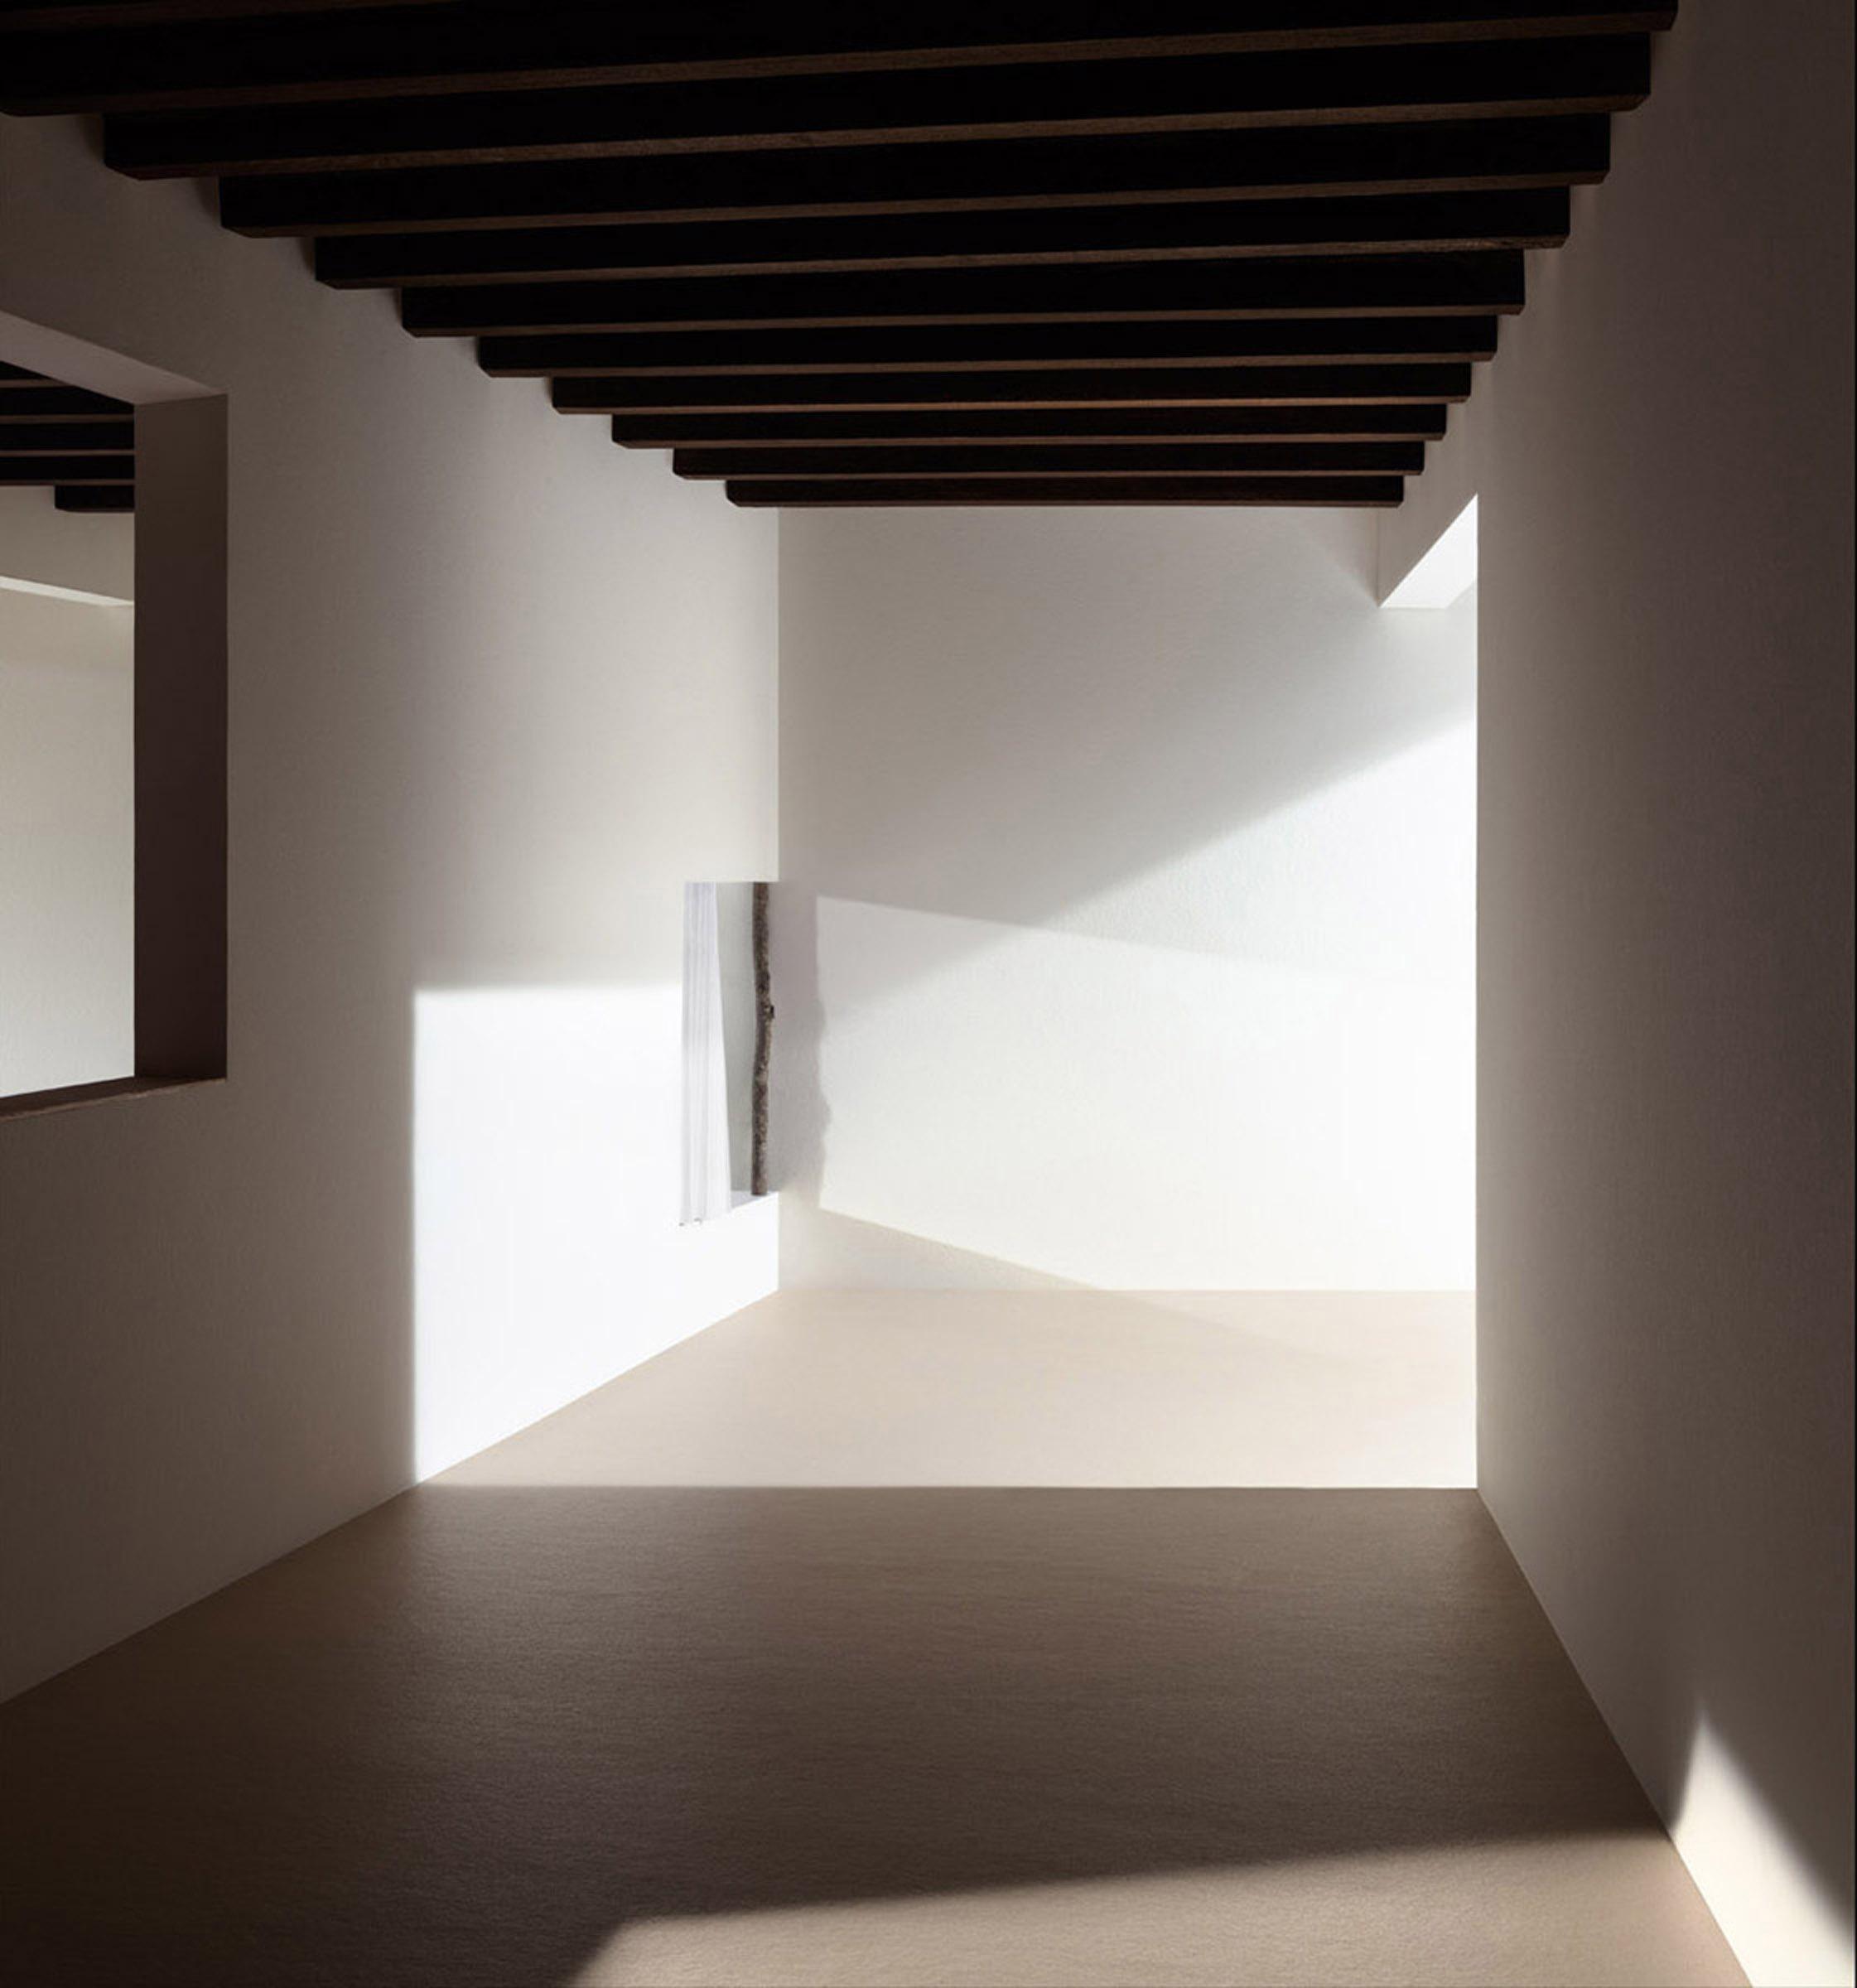 Foyer, 2017